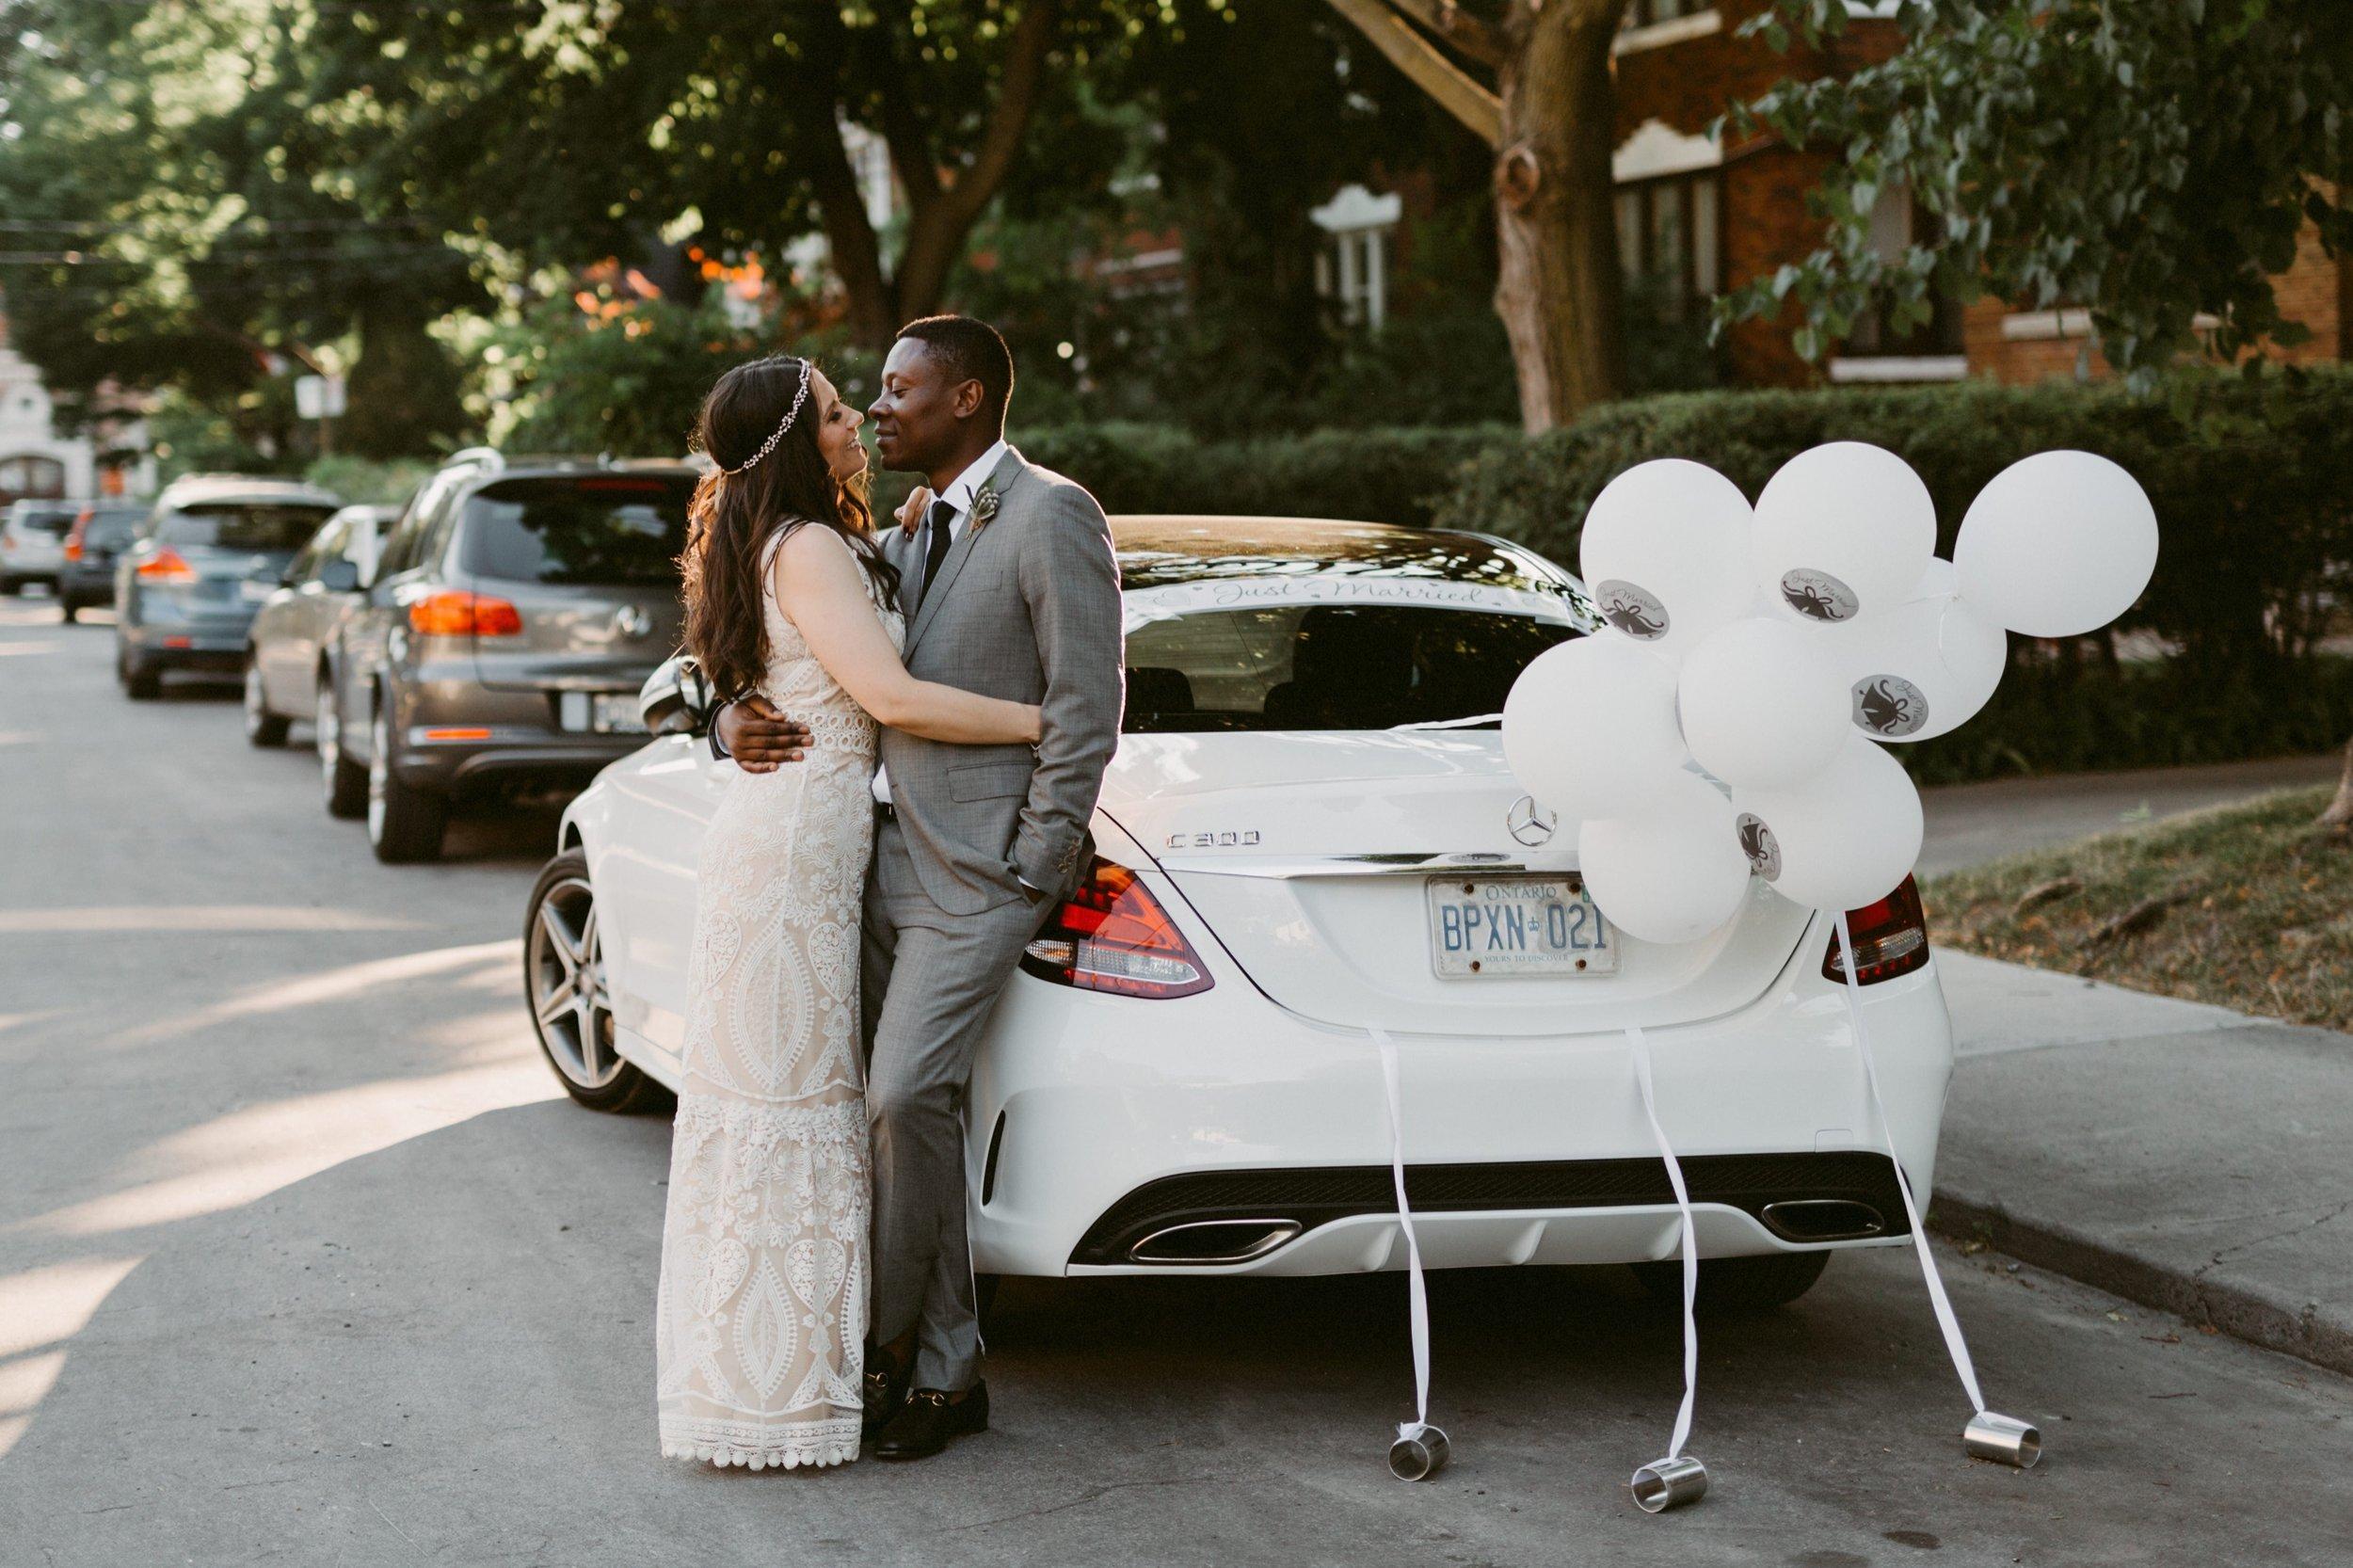 058_Spadina House Wedding (398 of 748)_House_Spadina_intimate_Toronto_Wedding.jpg